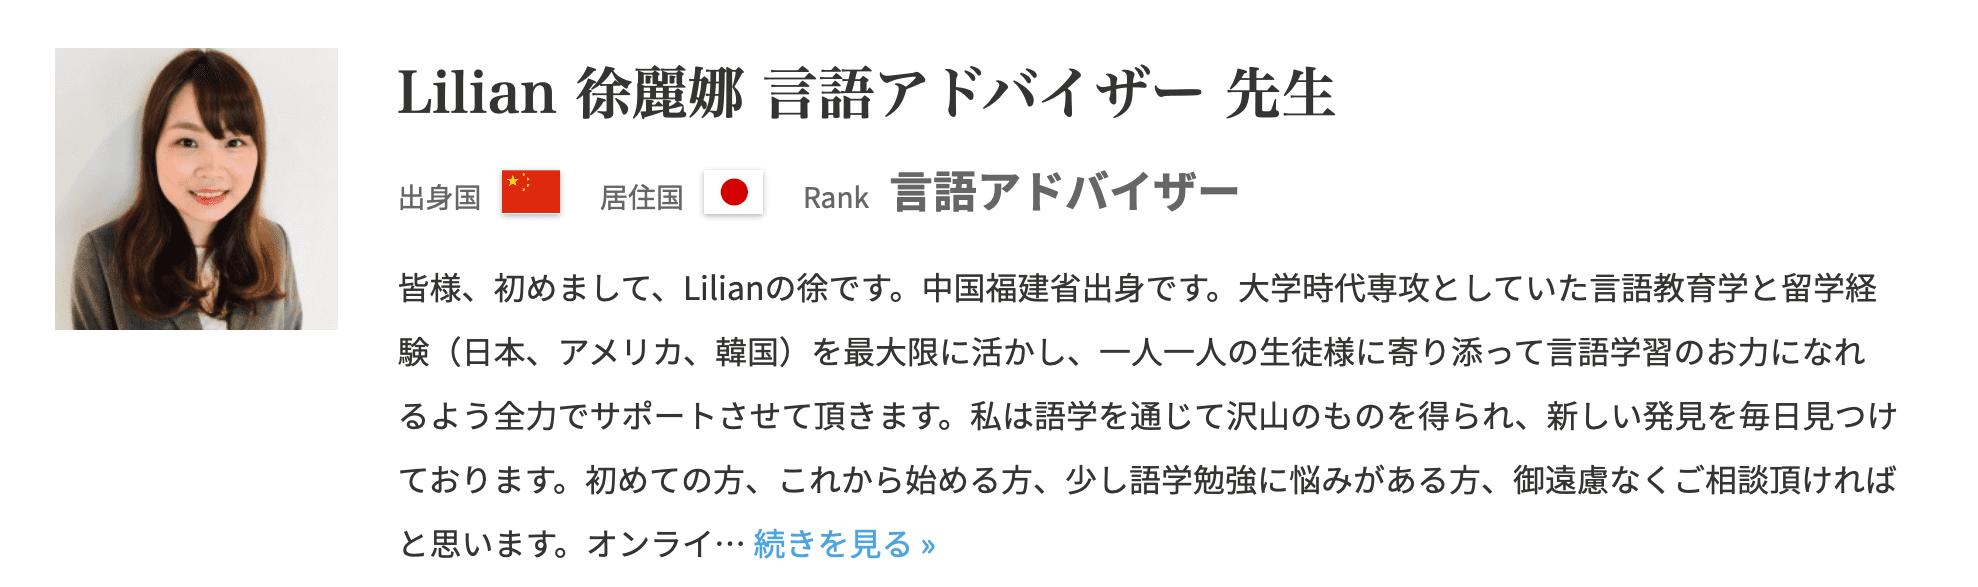 Lilian(リリアン)の口コミ評判について